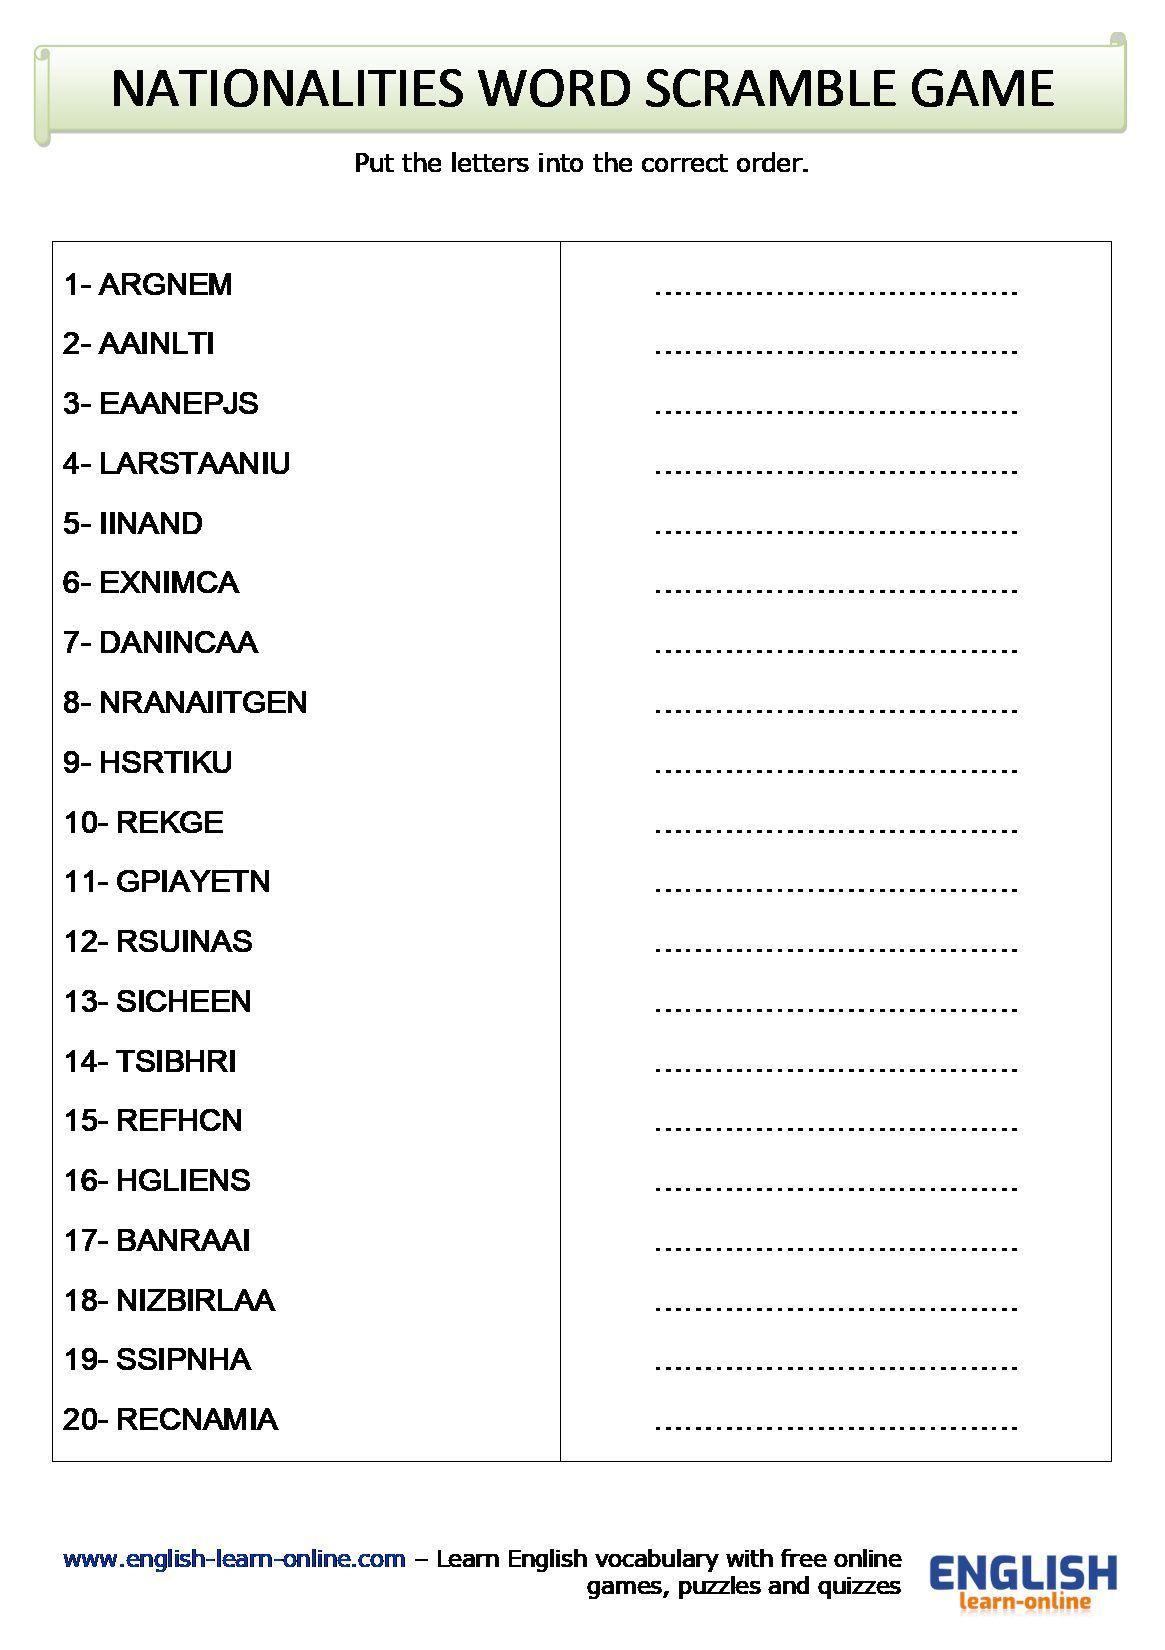 Nationalities Vocabulary Word Scramble Game Worksheet In